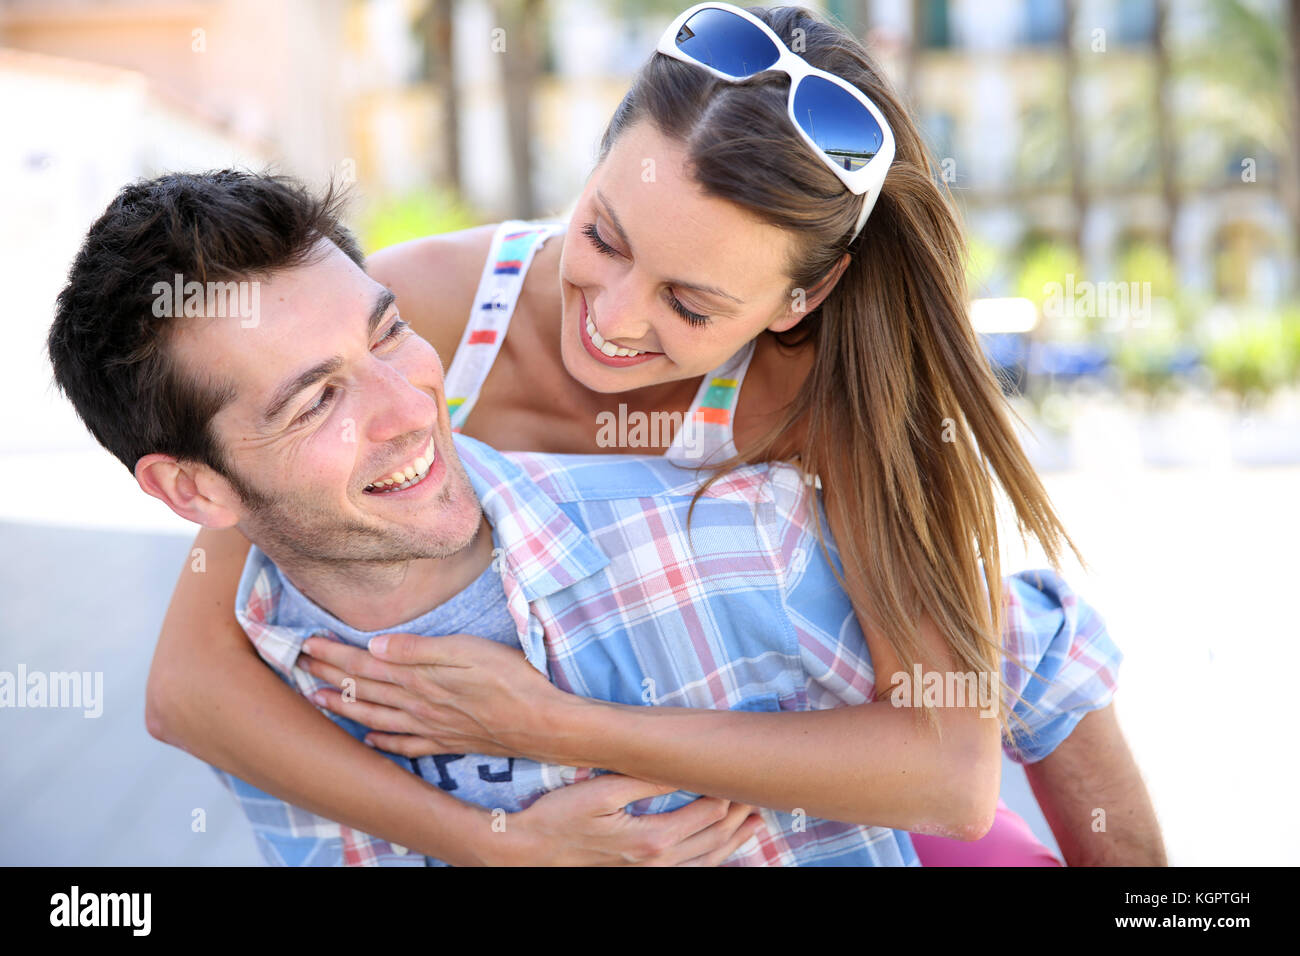 Man giving piggyback ride to girlfriend - Stock Image